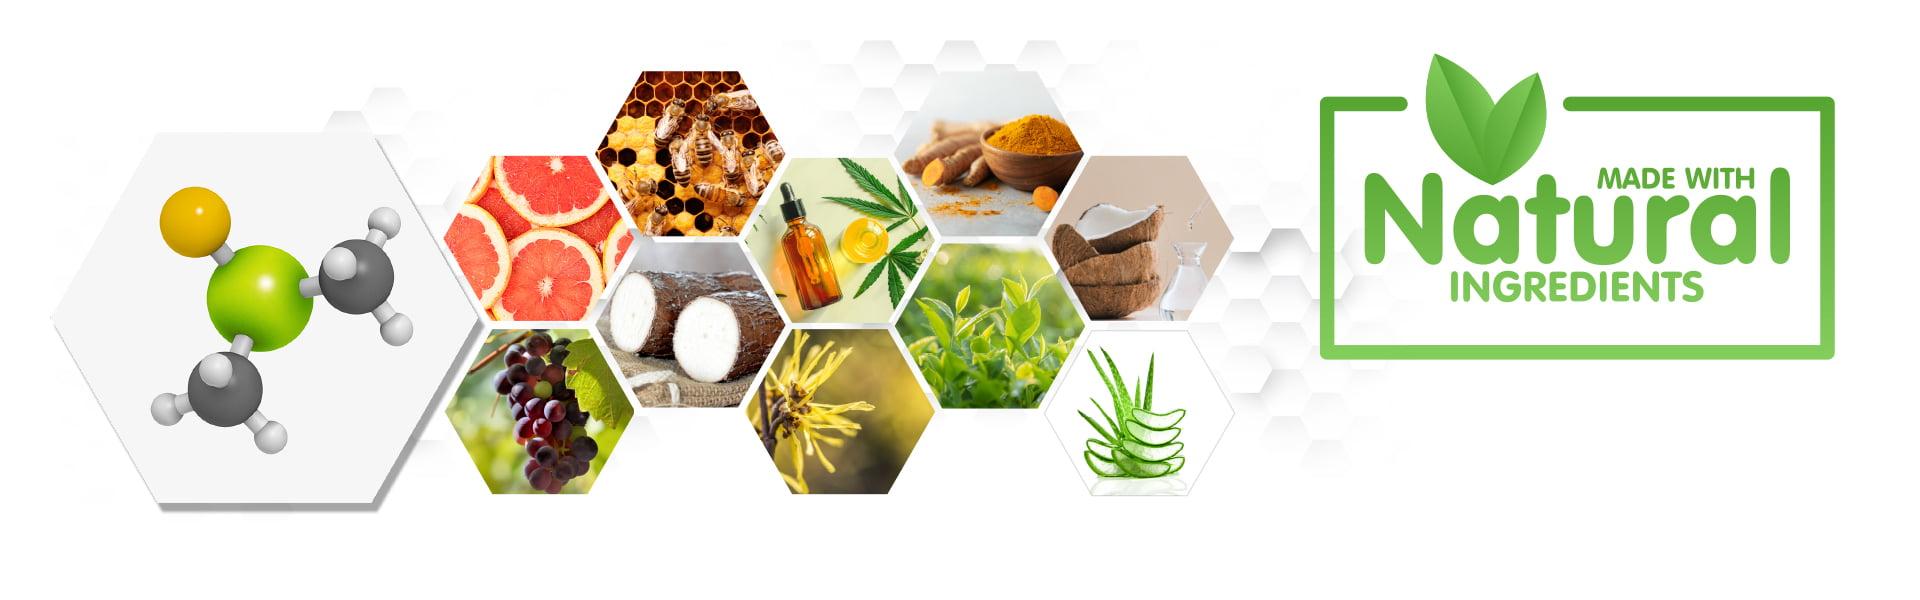 rxhemp-natural-warm-cool-medical-grade-topcial-thc-free-cbd-cream-Ingredients-Banner